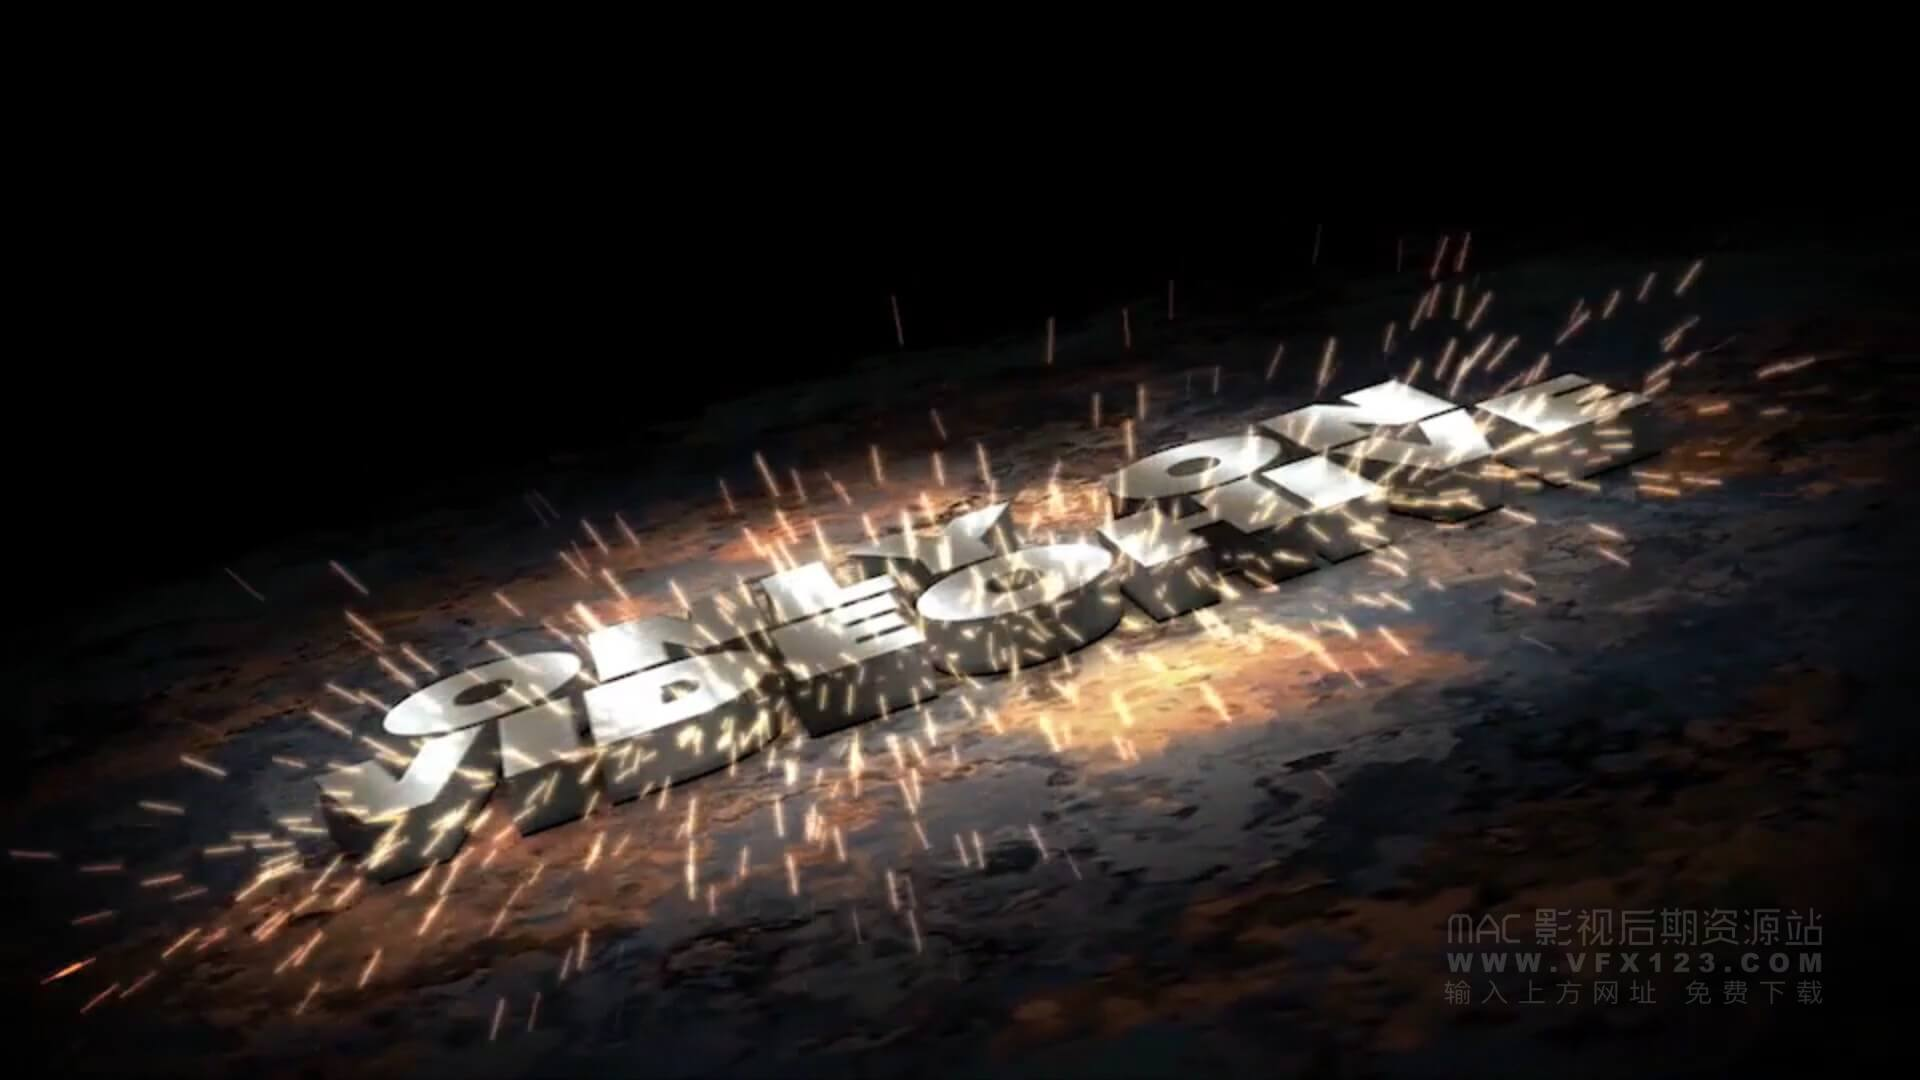 fcpx主题模板 震撼动作体育游戏类电影预告片 Metal Impact